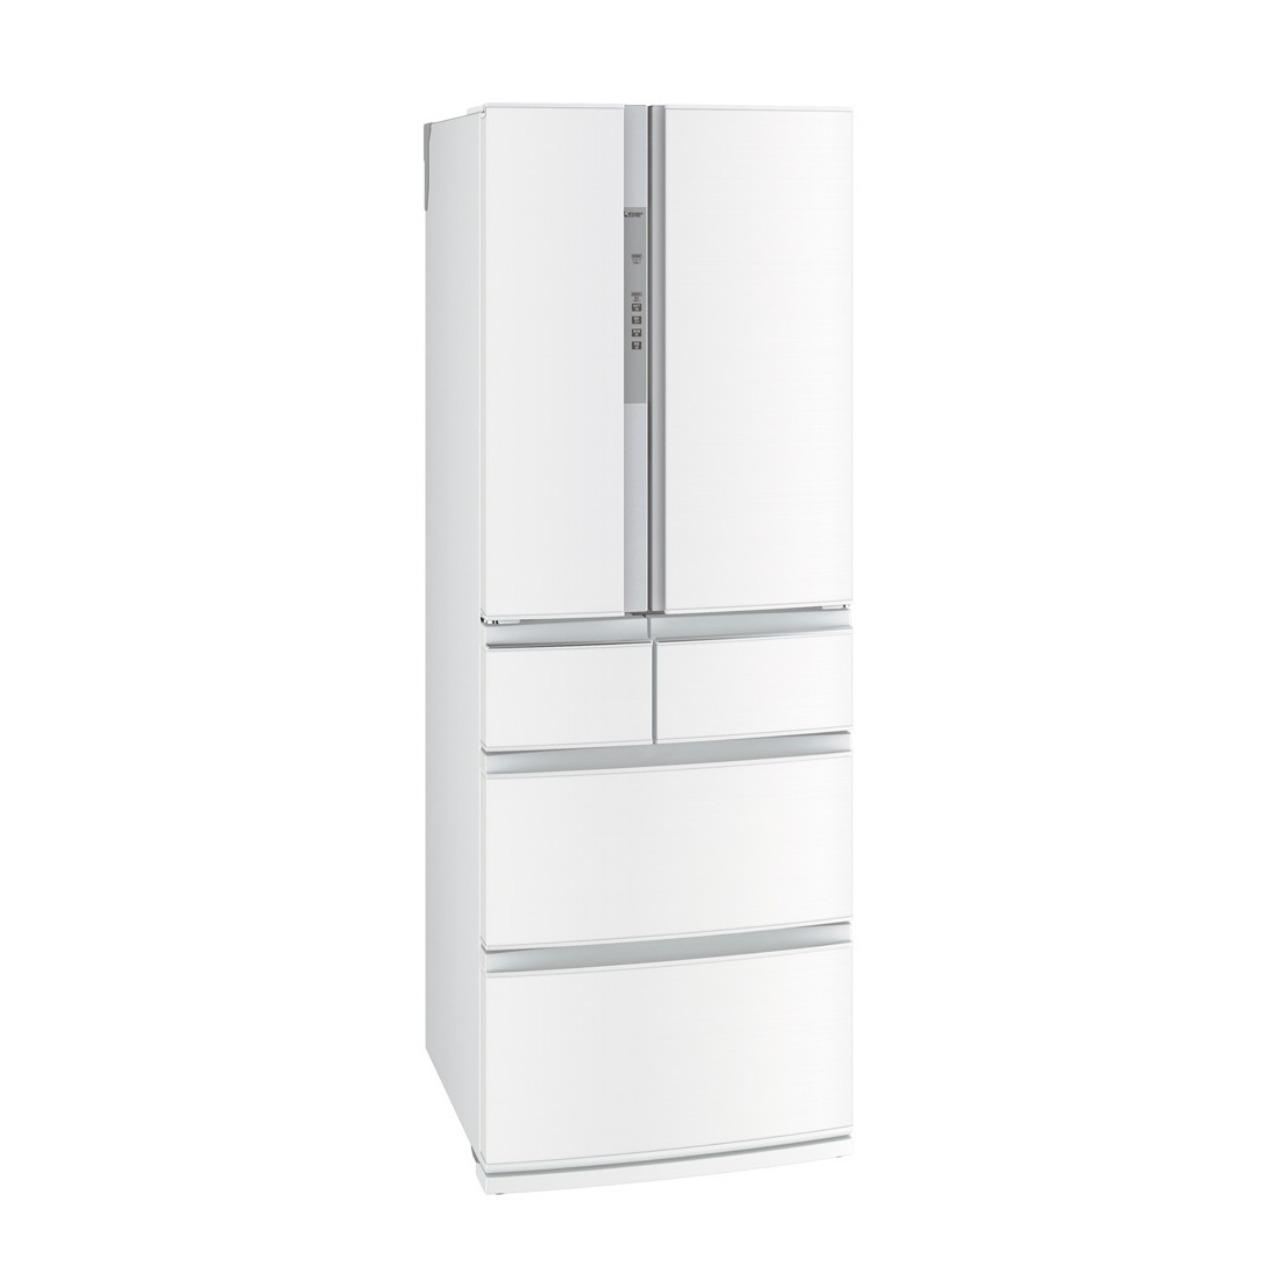 三菱MR-RX46C冷蔵庫